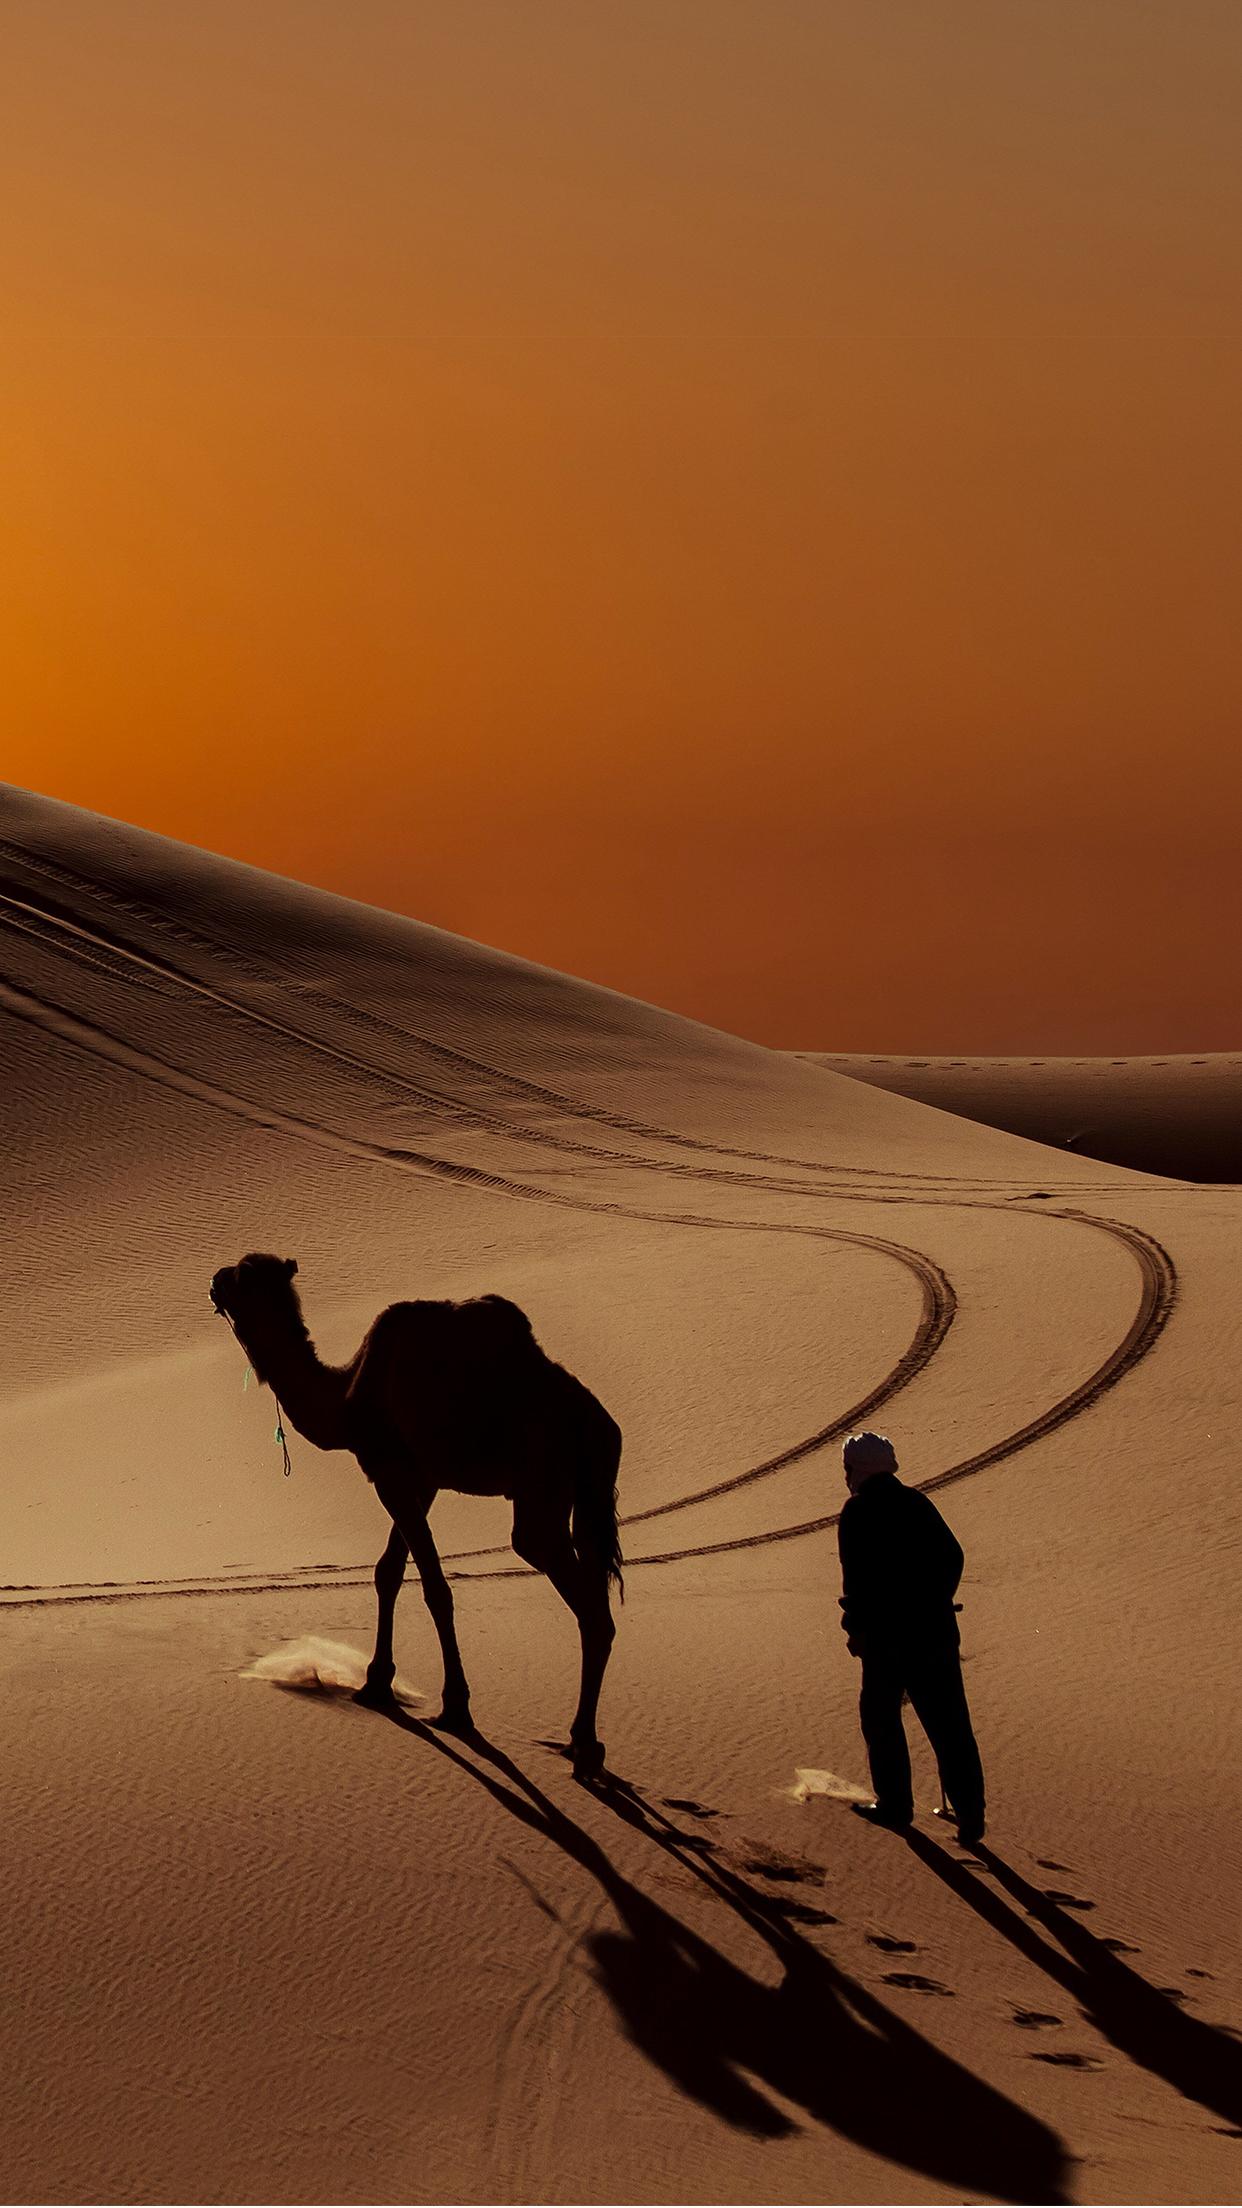 Camel Desert Wallpaper For Iphone X 8 7 6 Free Download